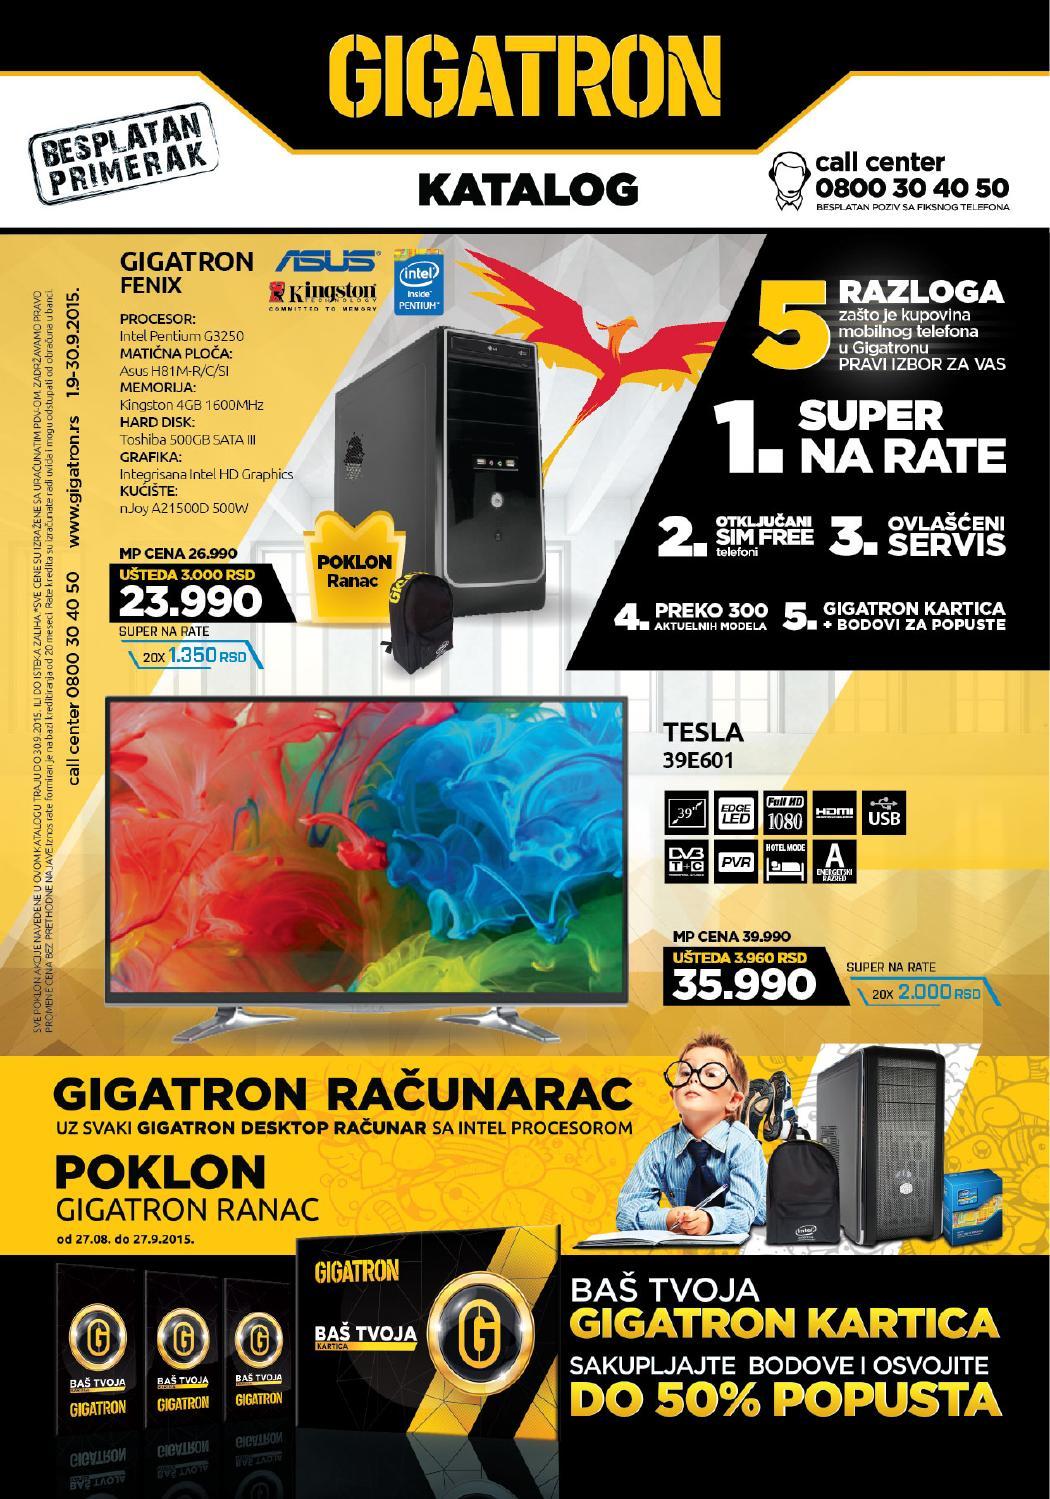 Gigatron Katalog Septembar 2015 By Gigatron Shop Issuu